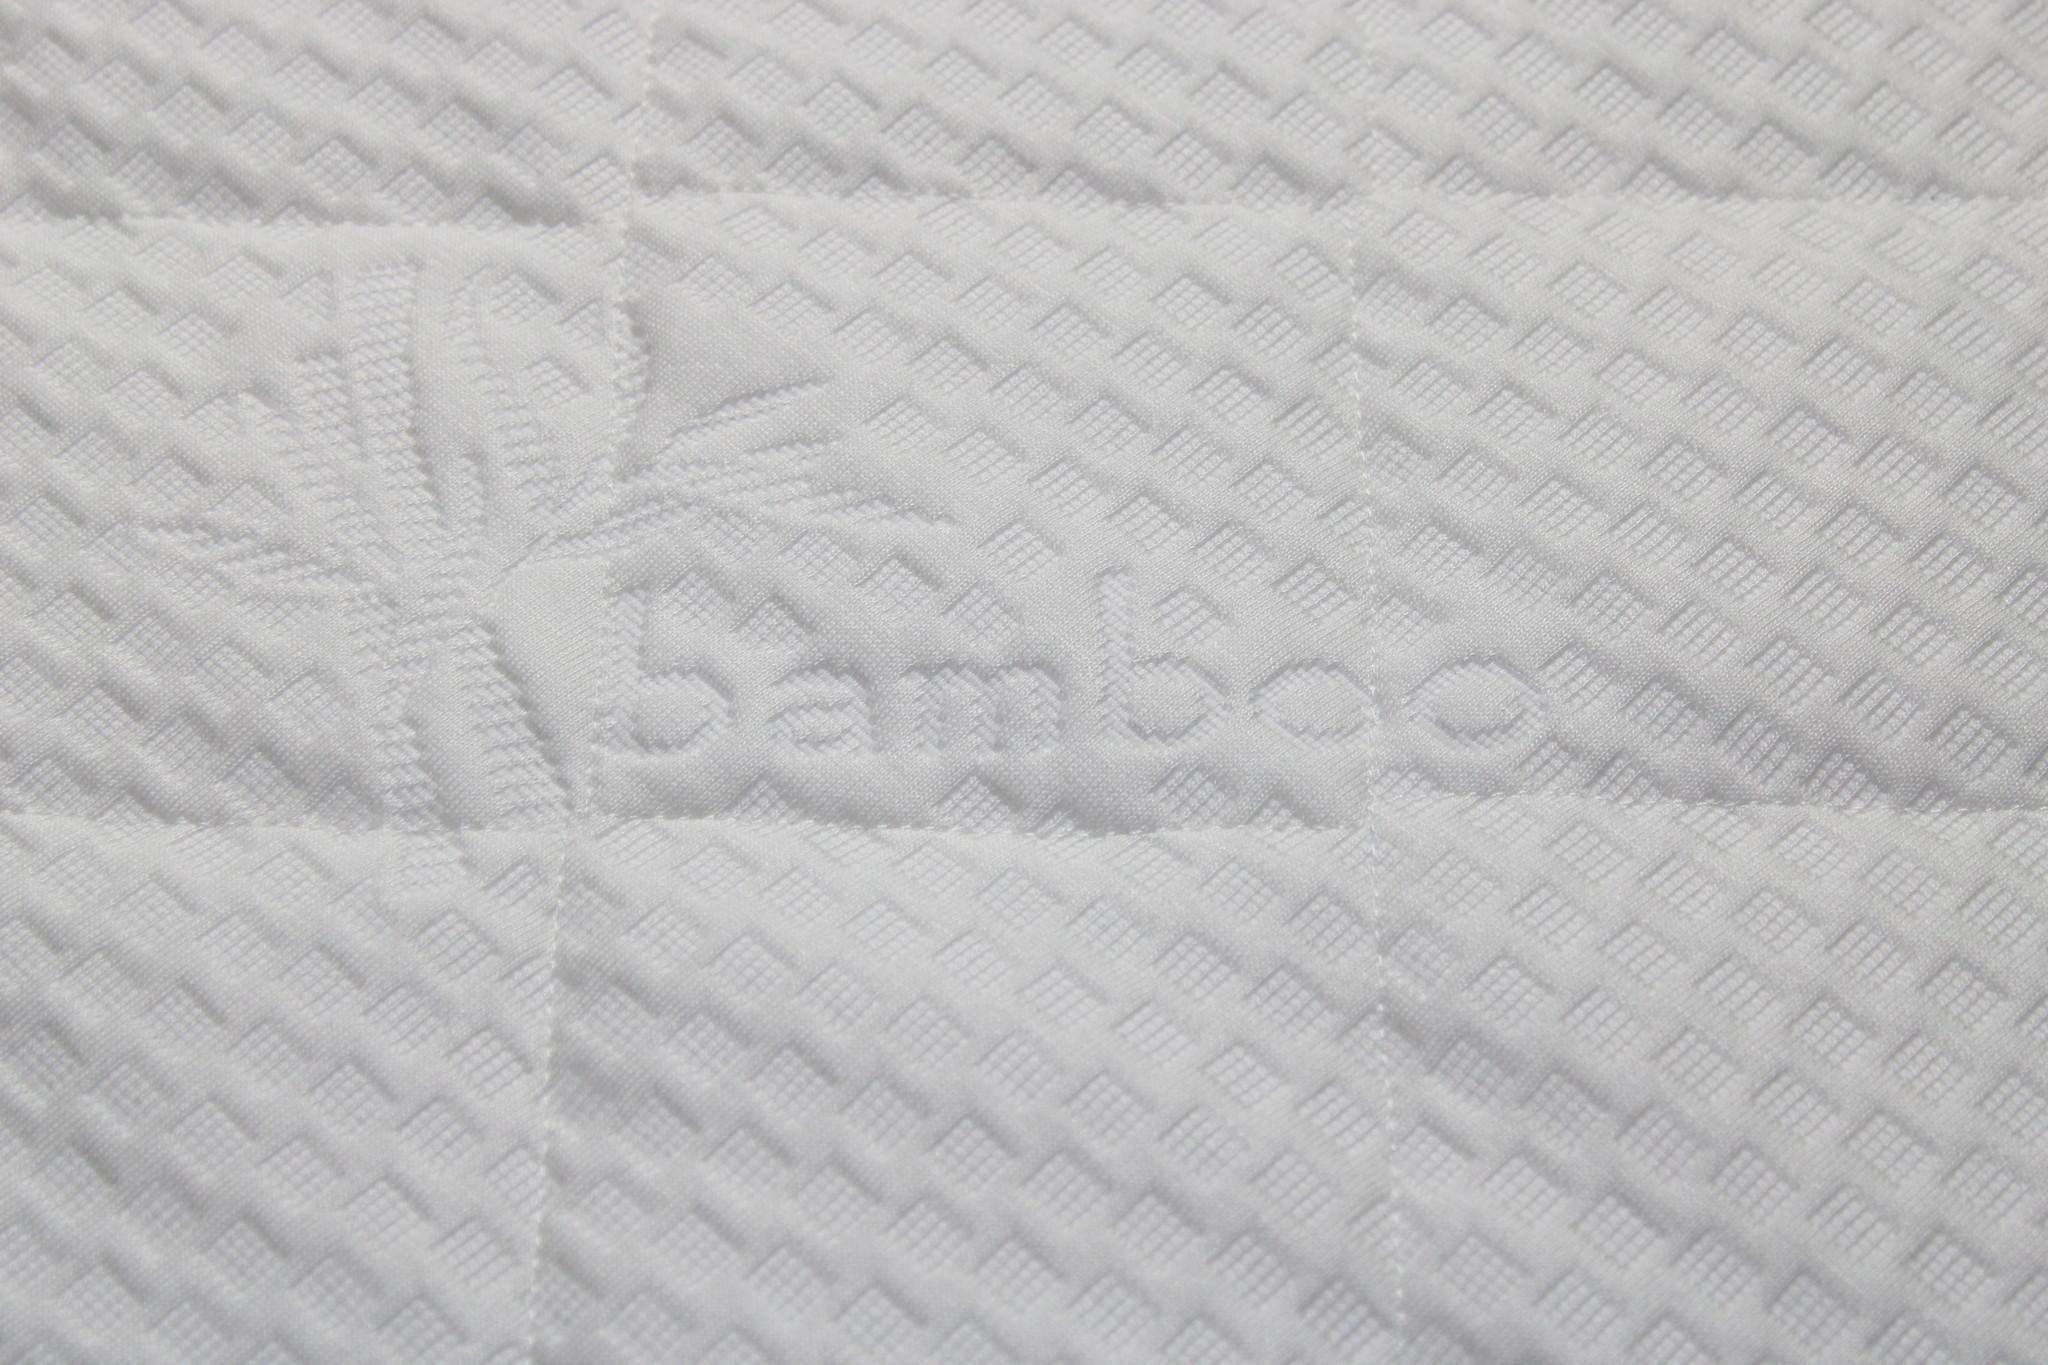 Sarpy Kindermatras 90x160 koudschuim HR55 bamboo